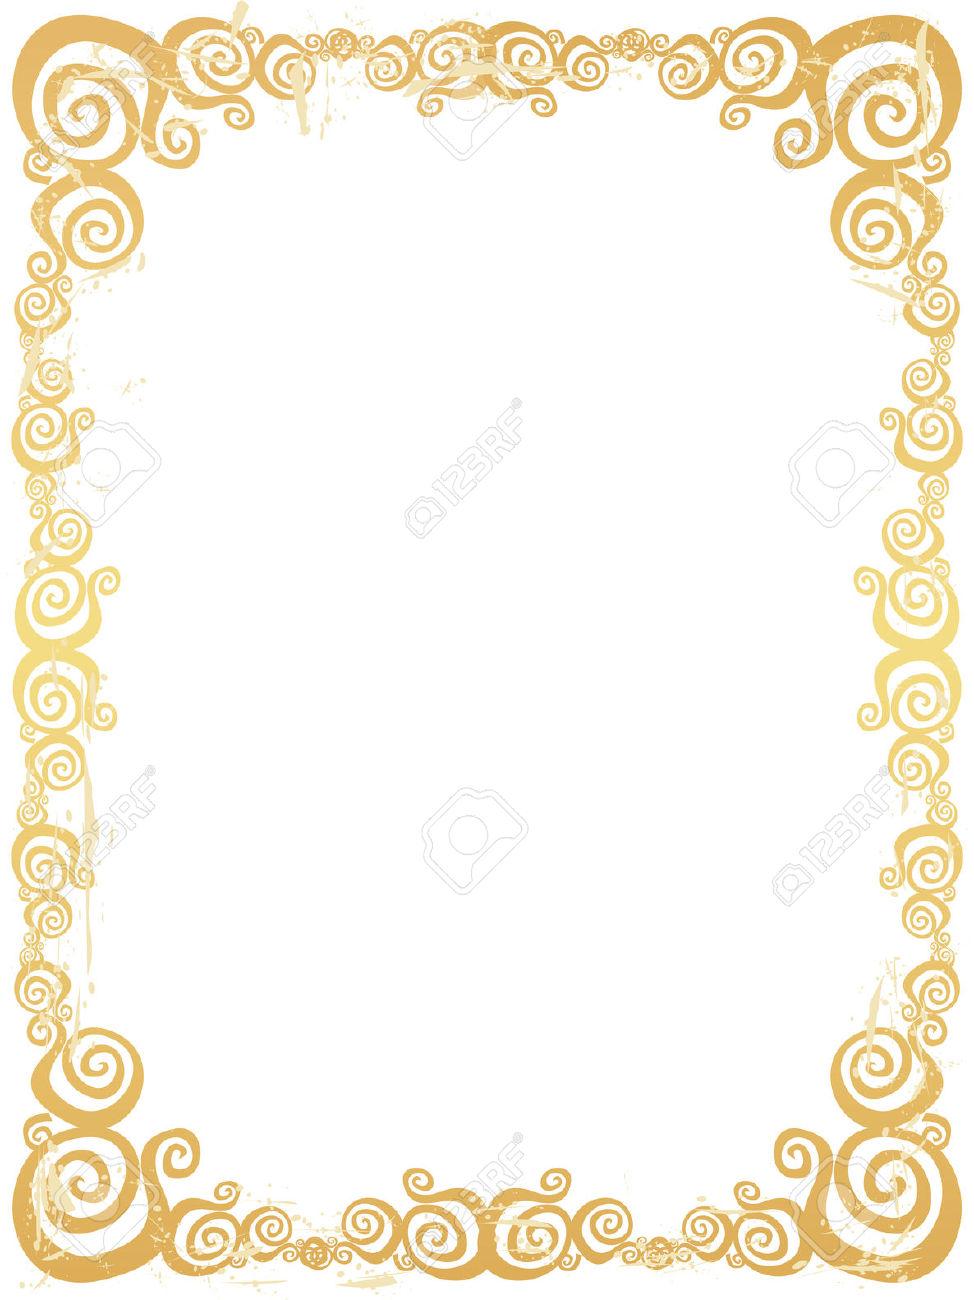 gold border clipart free download best gold border Heart Designs Clip Art free filigree heart clip art